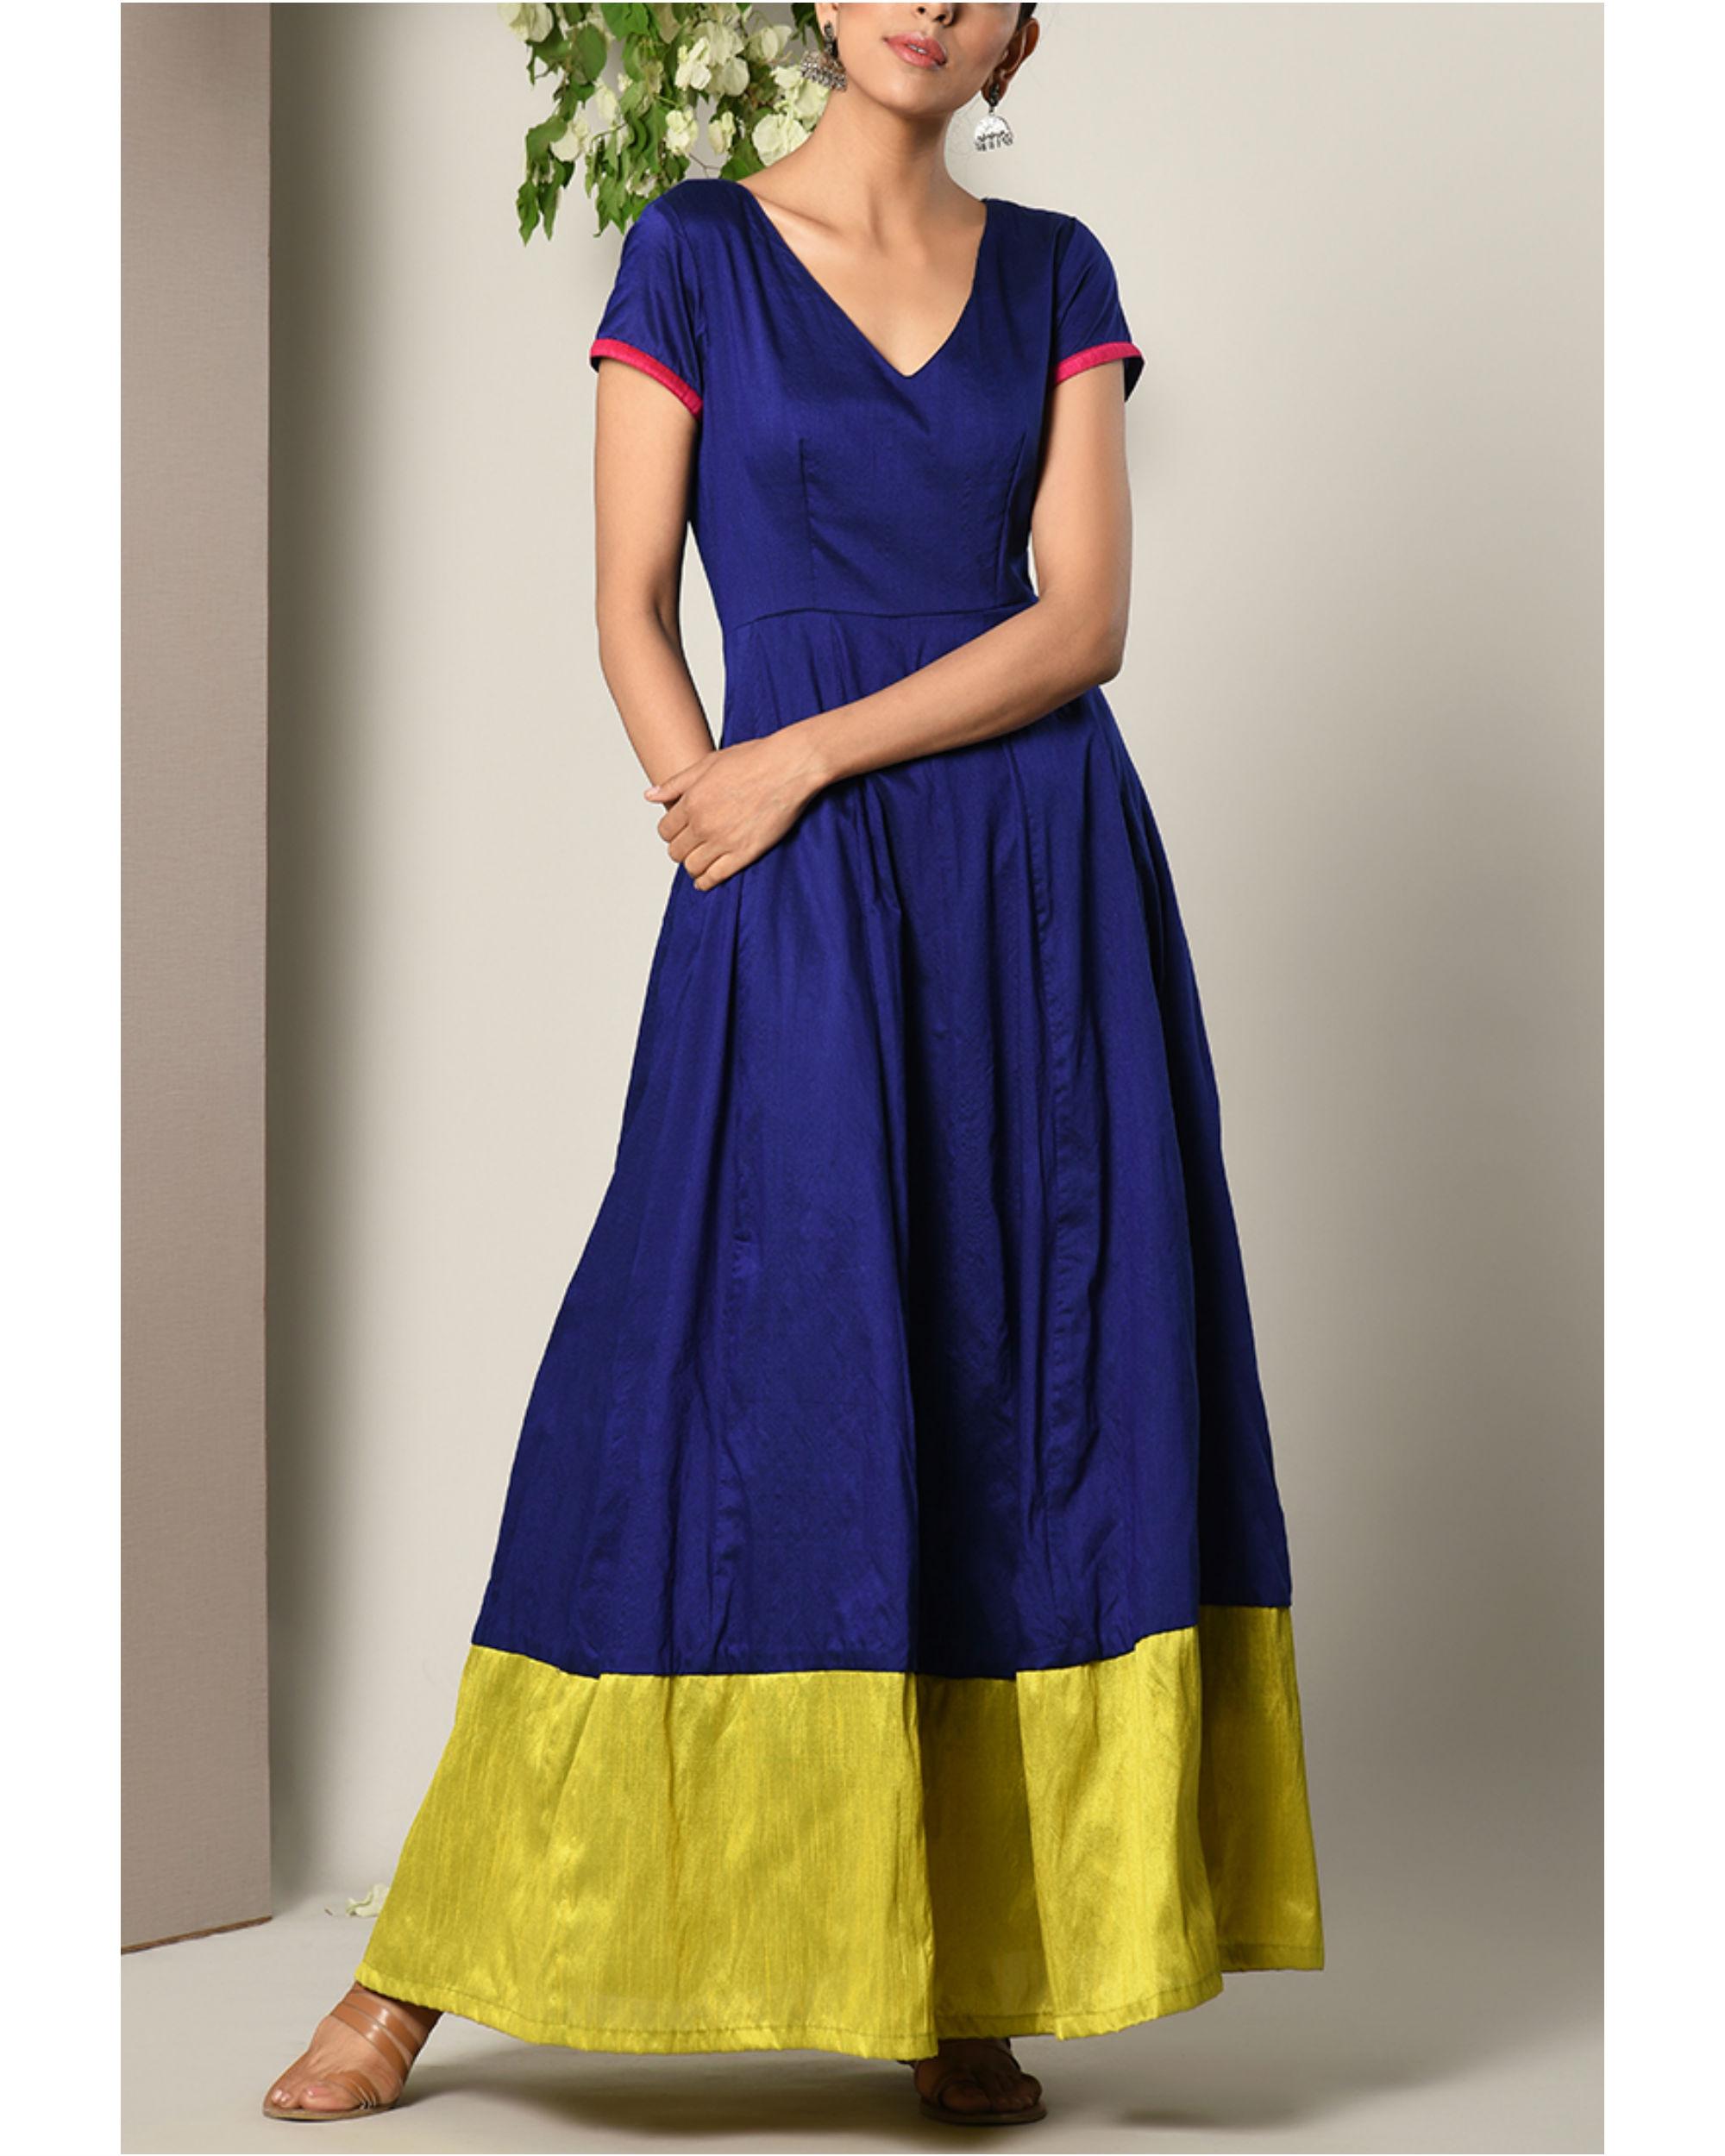 Blue panelled border dress